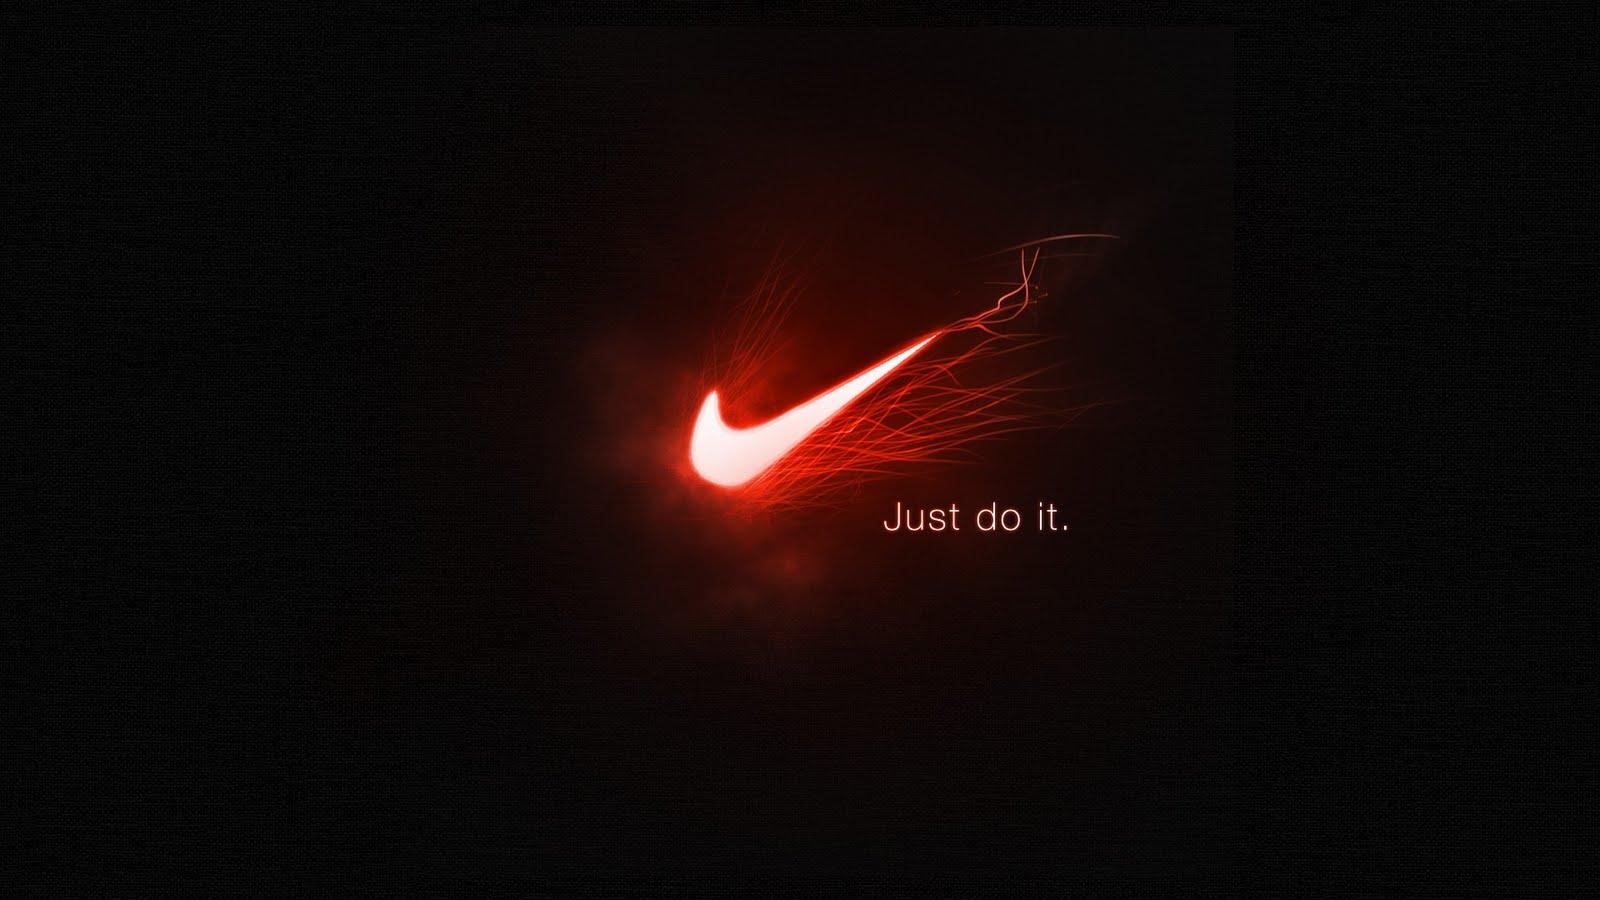 Nike Wallpaper HD